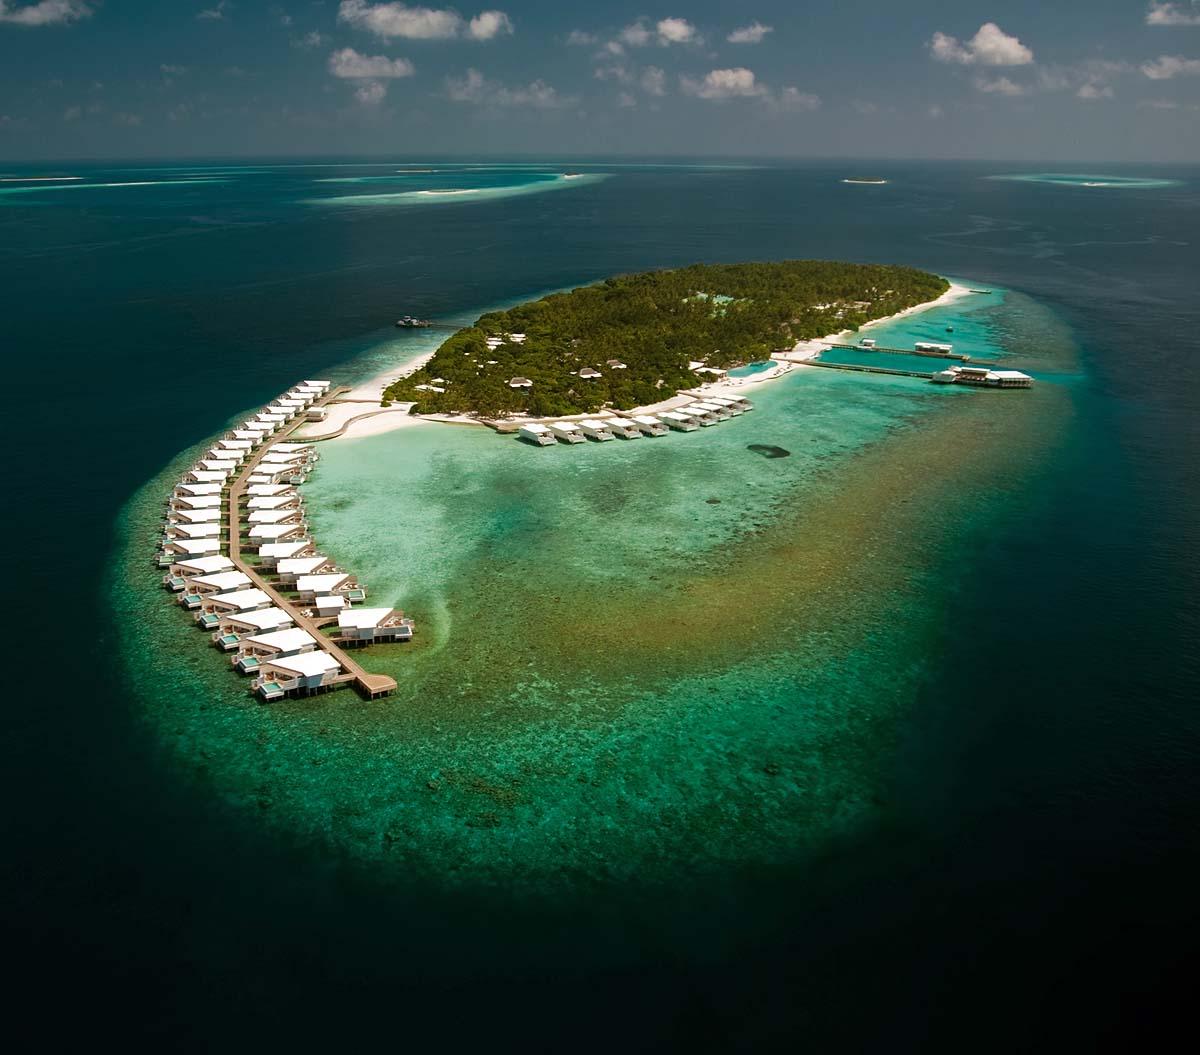 Vogelperspektive der Insel, Amilla Fushi, Malediven